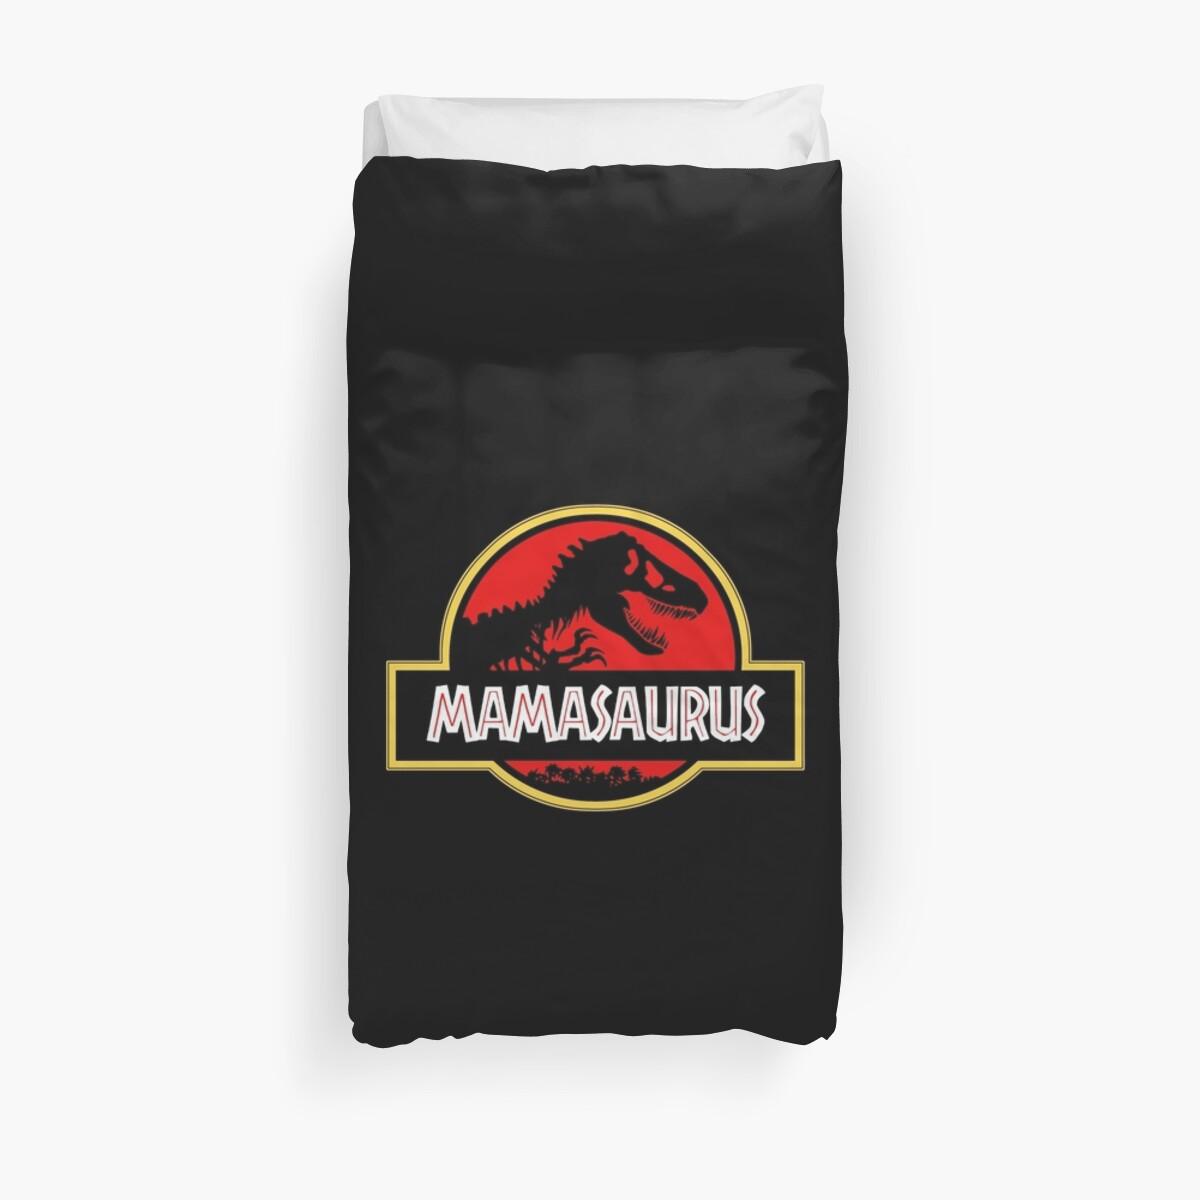 Mamasaurus by BrambleBox